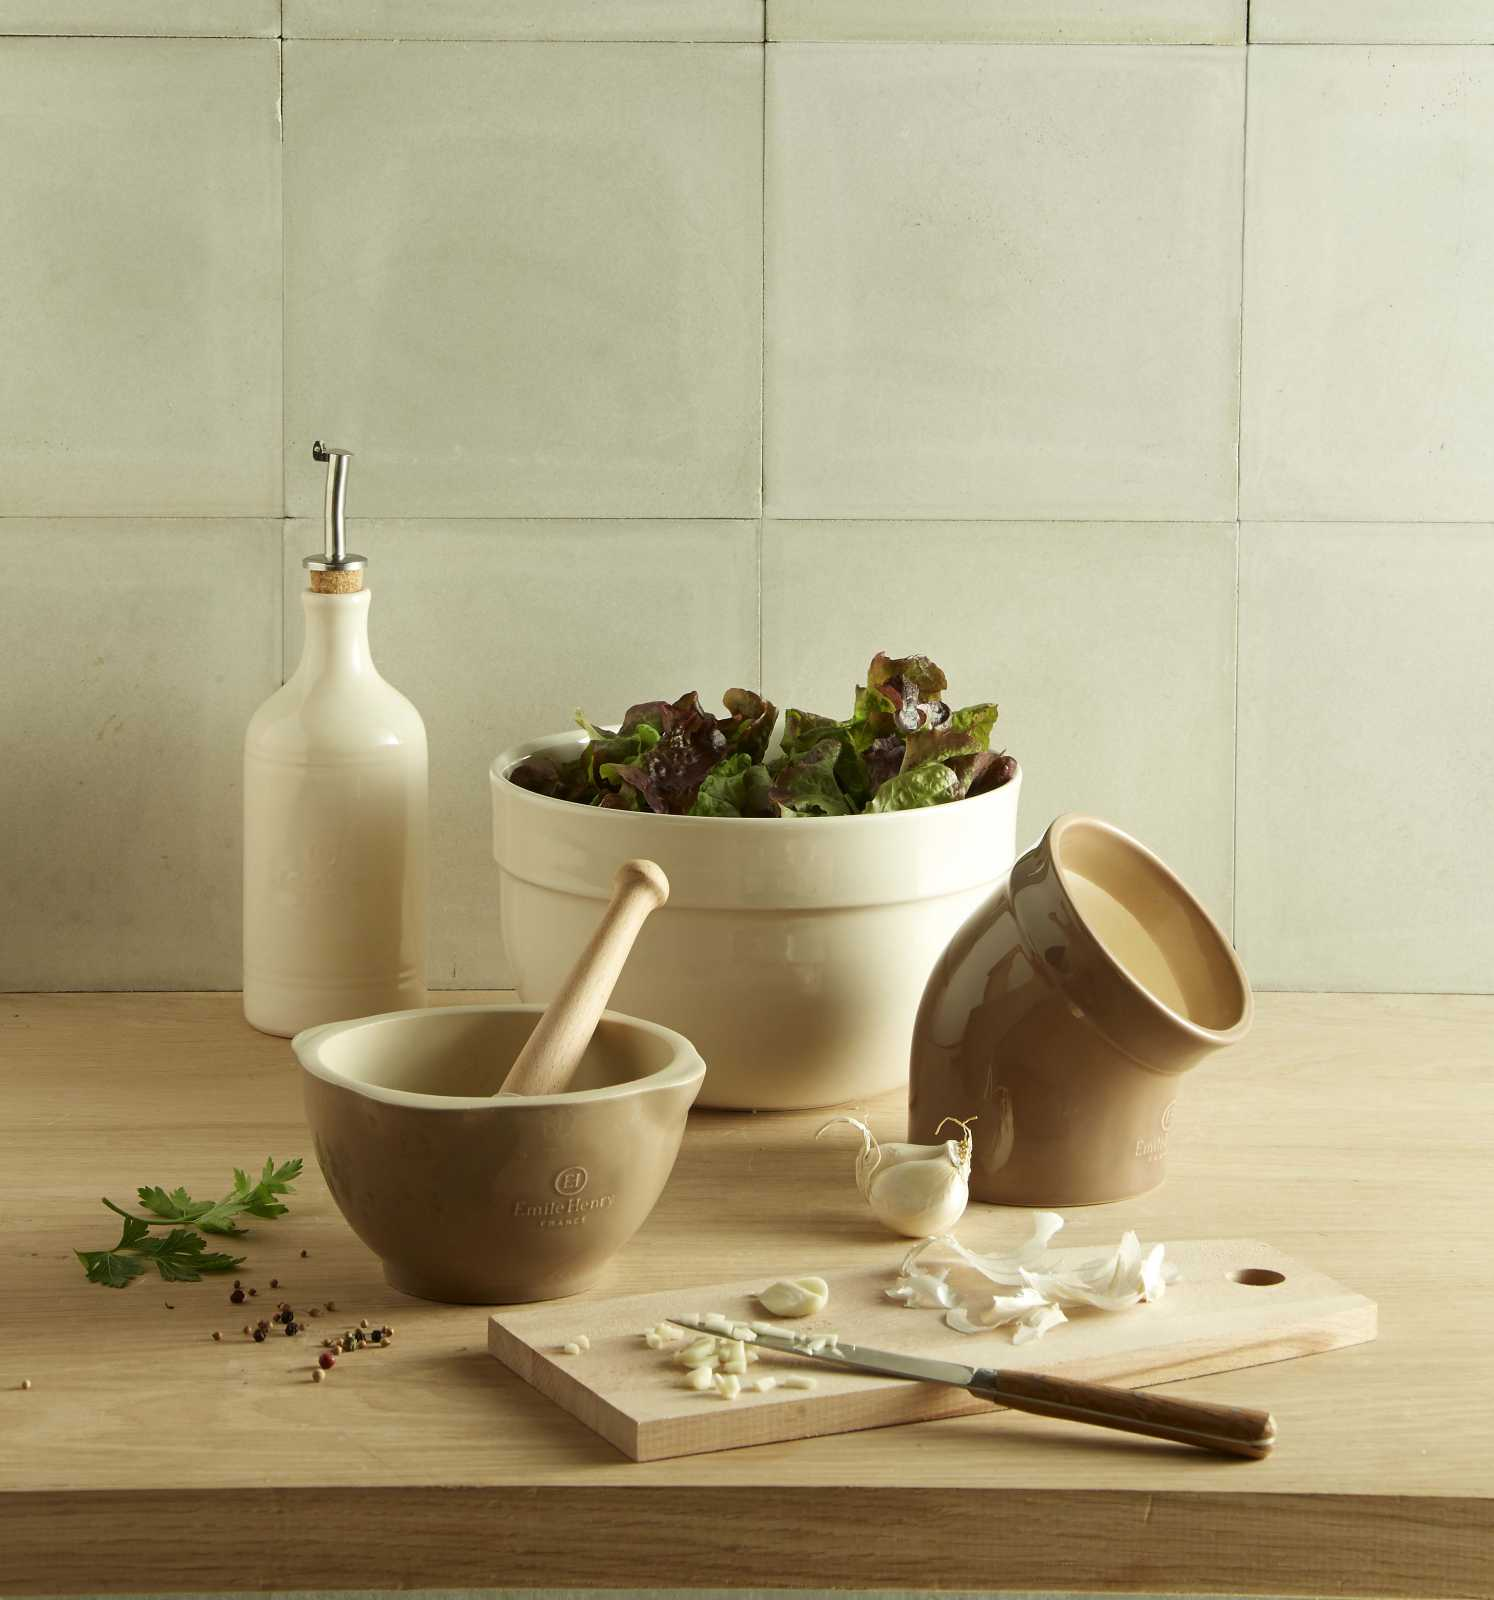 Салатник керамический Emile Henry Kitchen Tools, 21,5 см, бежевый Emile Henry 026524 фото 1